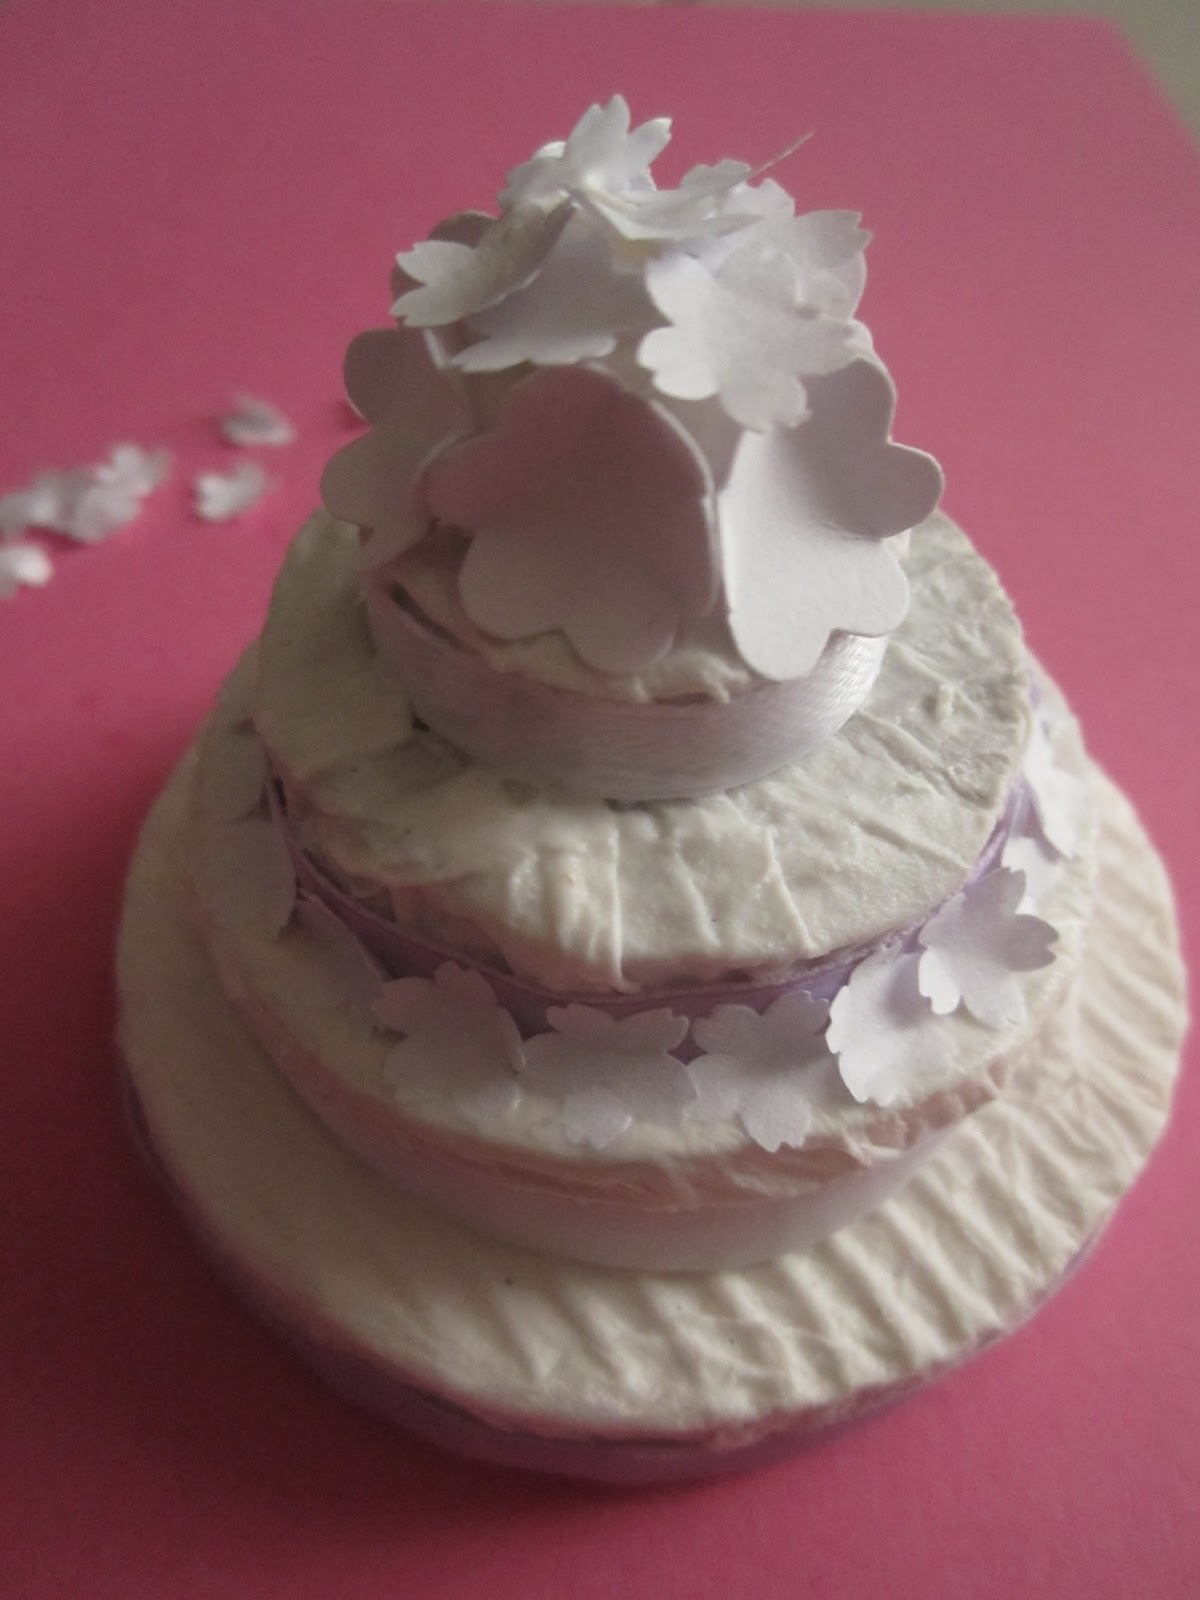 decorandaeisuoilabirinti: Torta nuziale di cartoncino